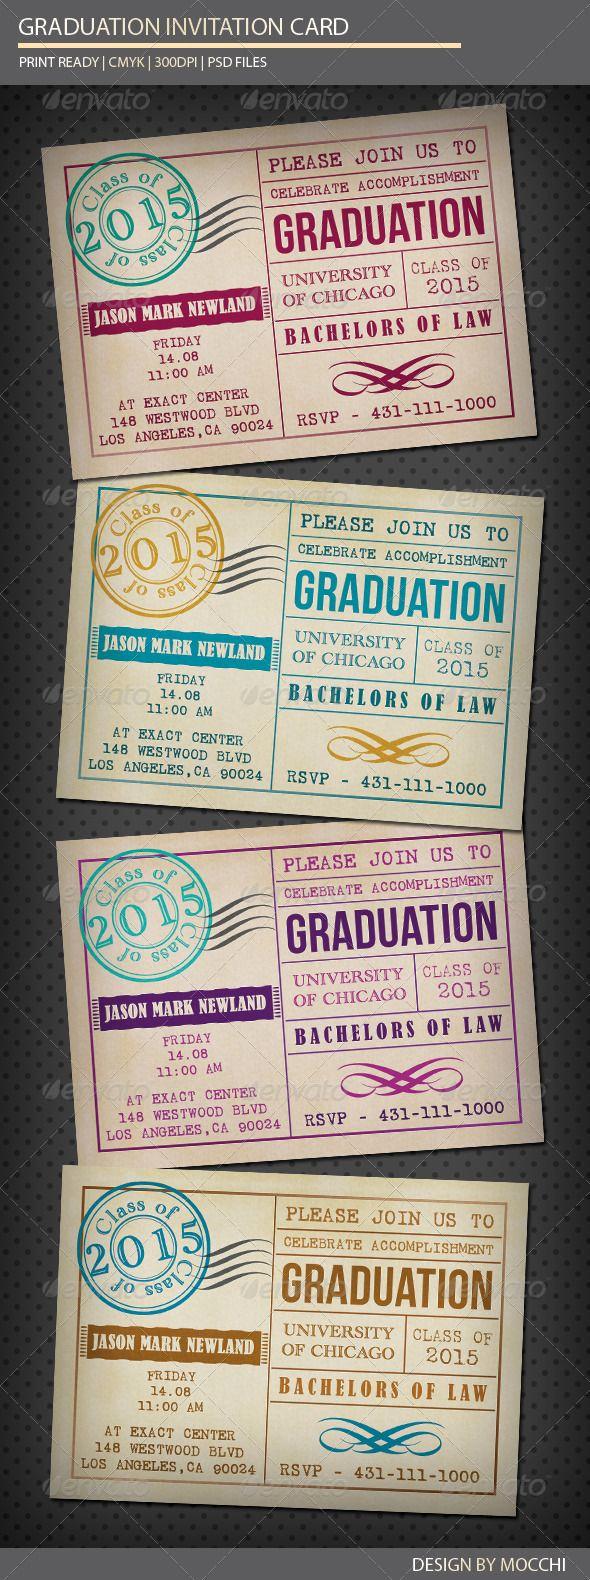 College Graduation Invitation Cards Fresh Best 25 Graduation Invitations Ideas On Pinterest